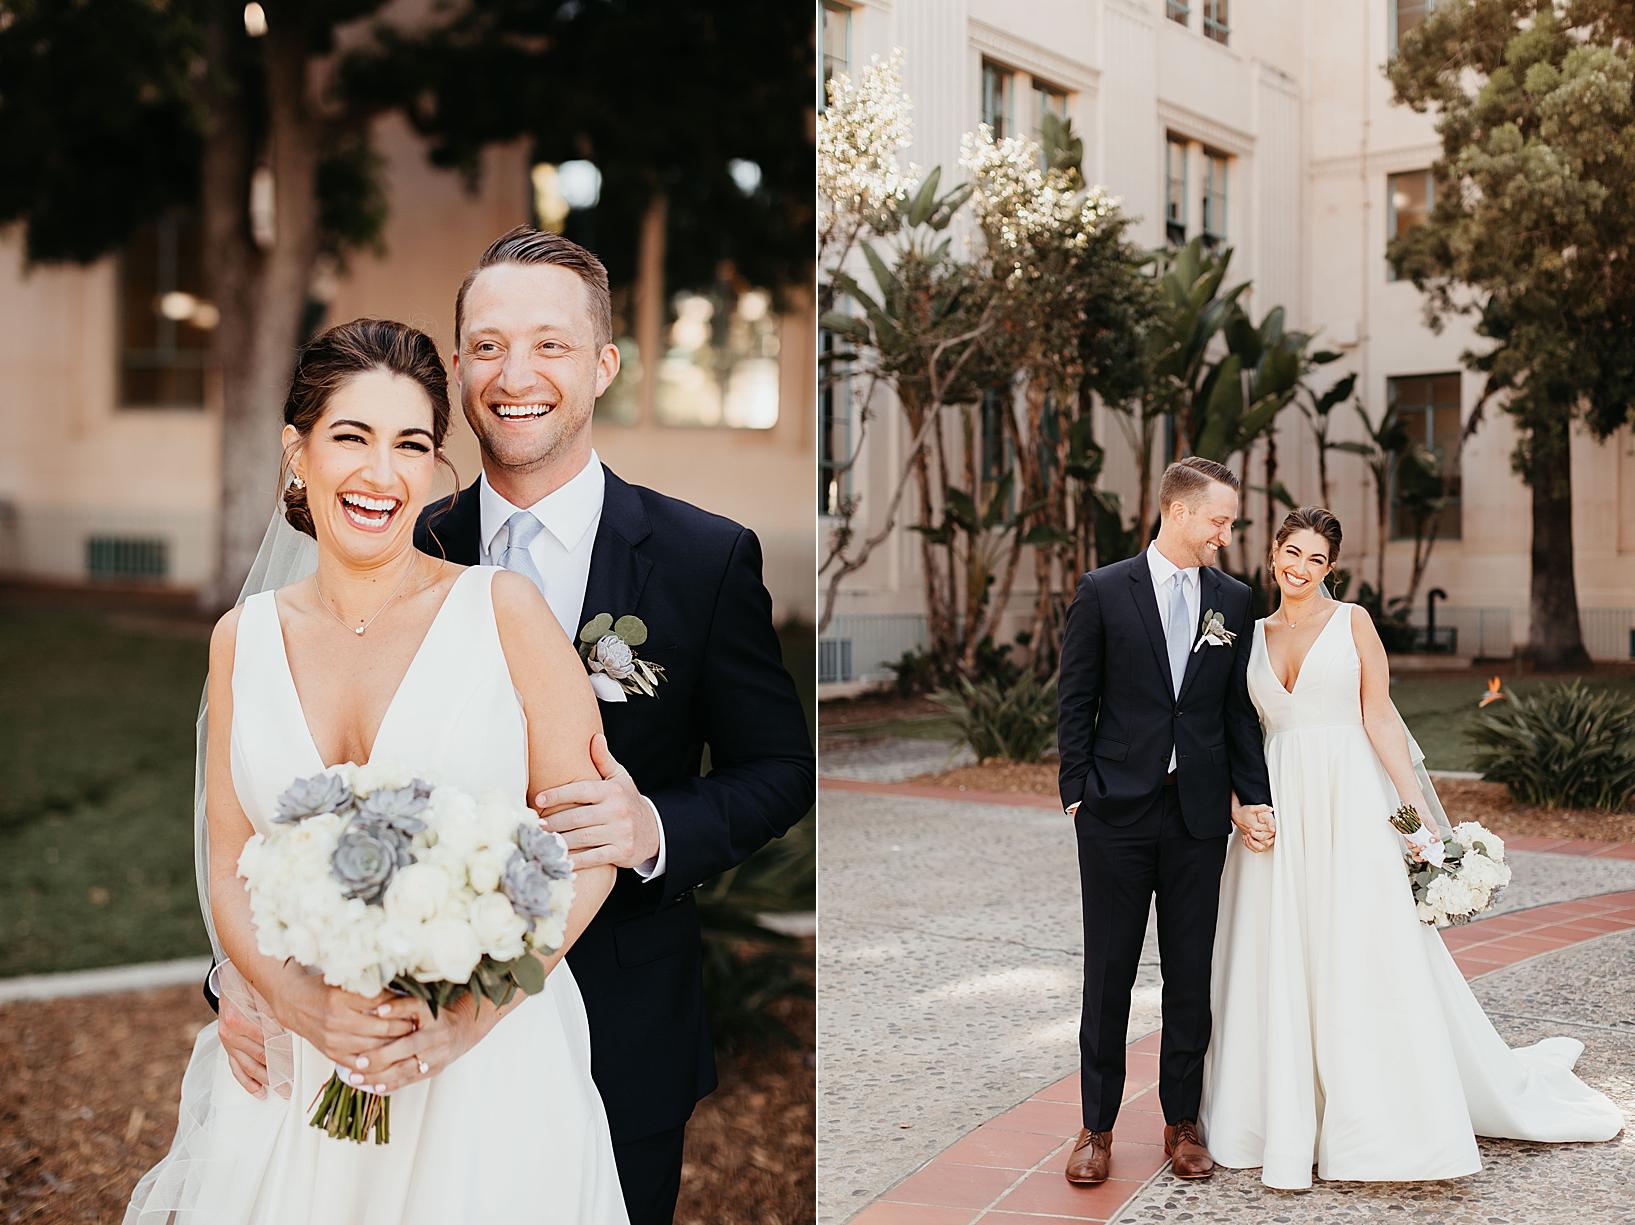 Herb-and-Wood-Wedding-27.jpg